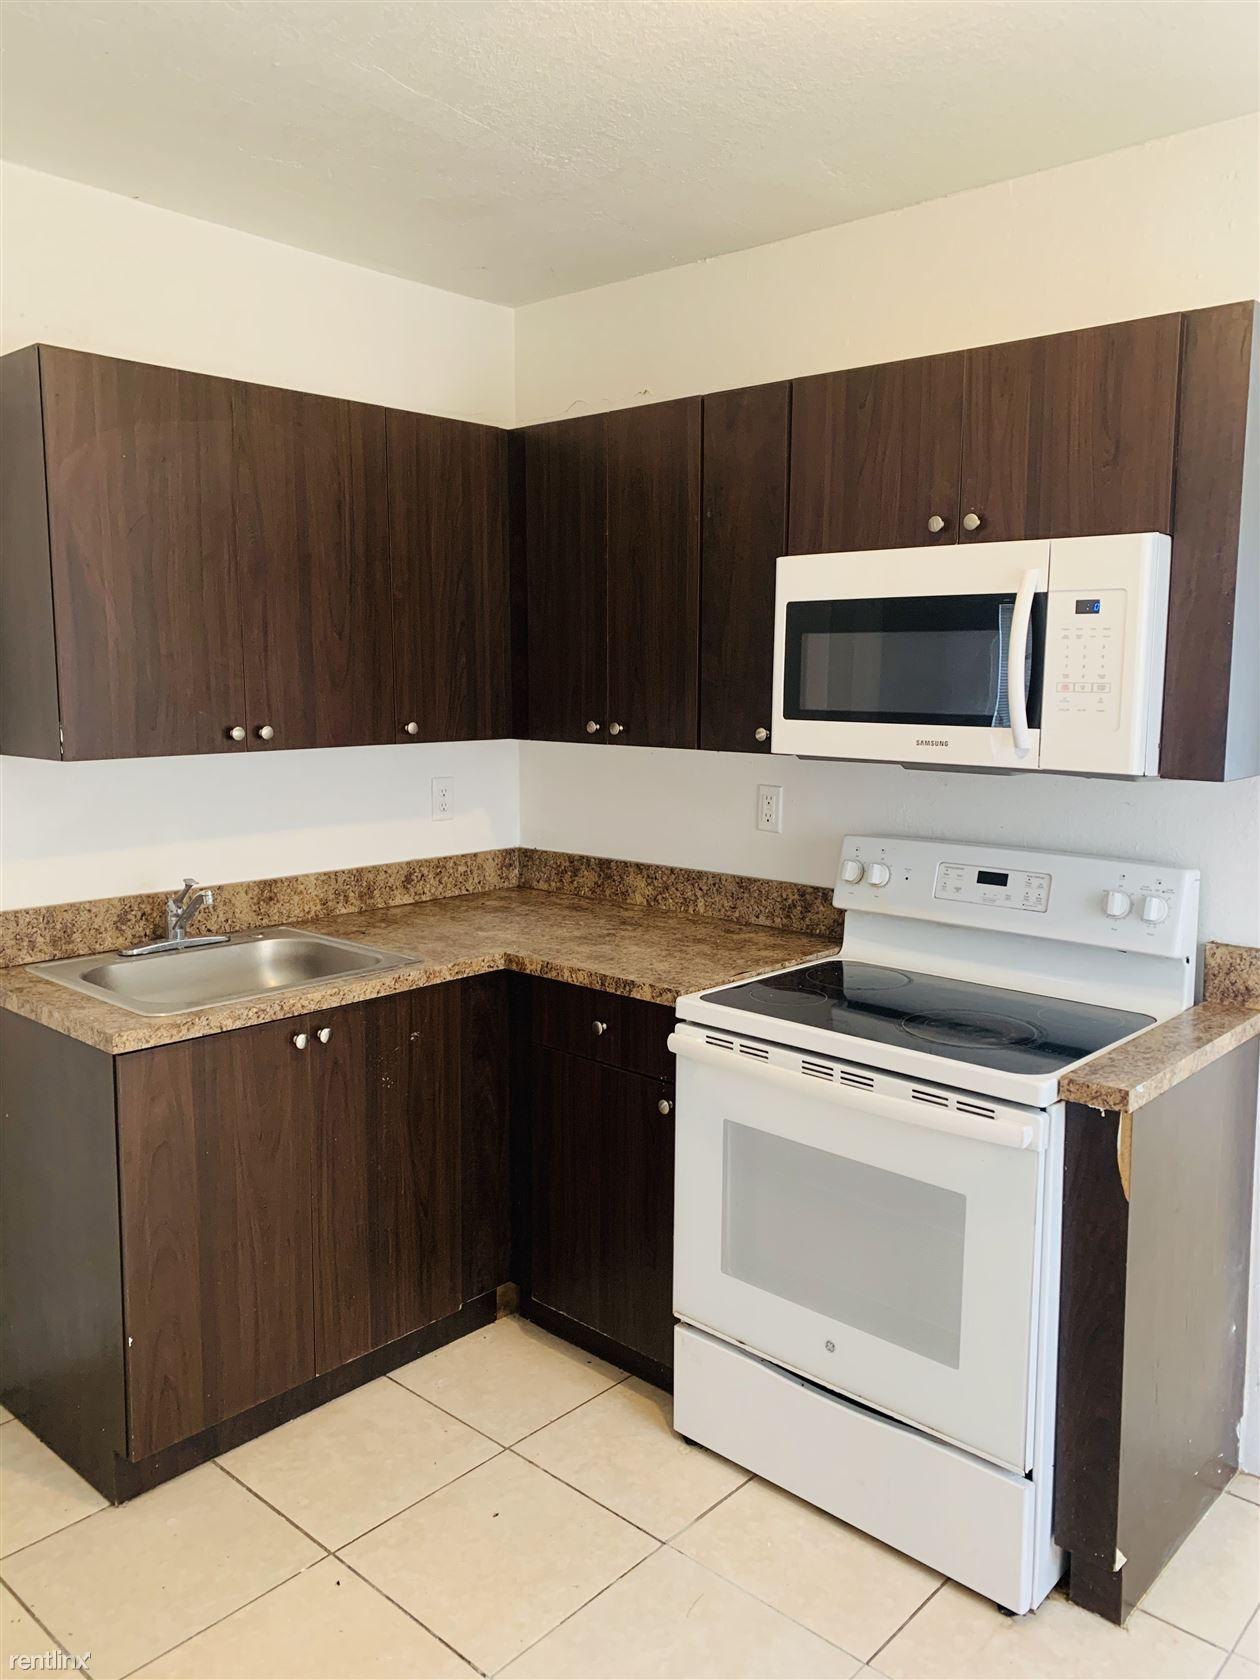 701 NE 86th St for rent